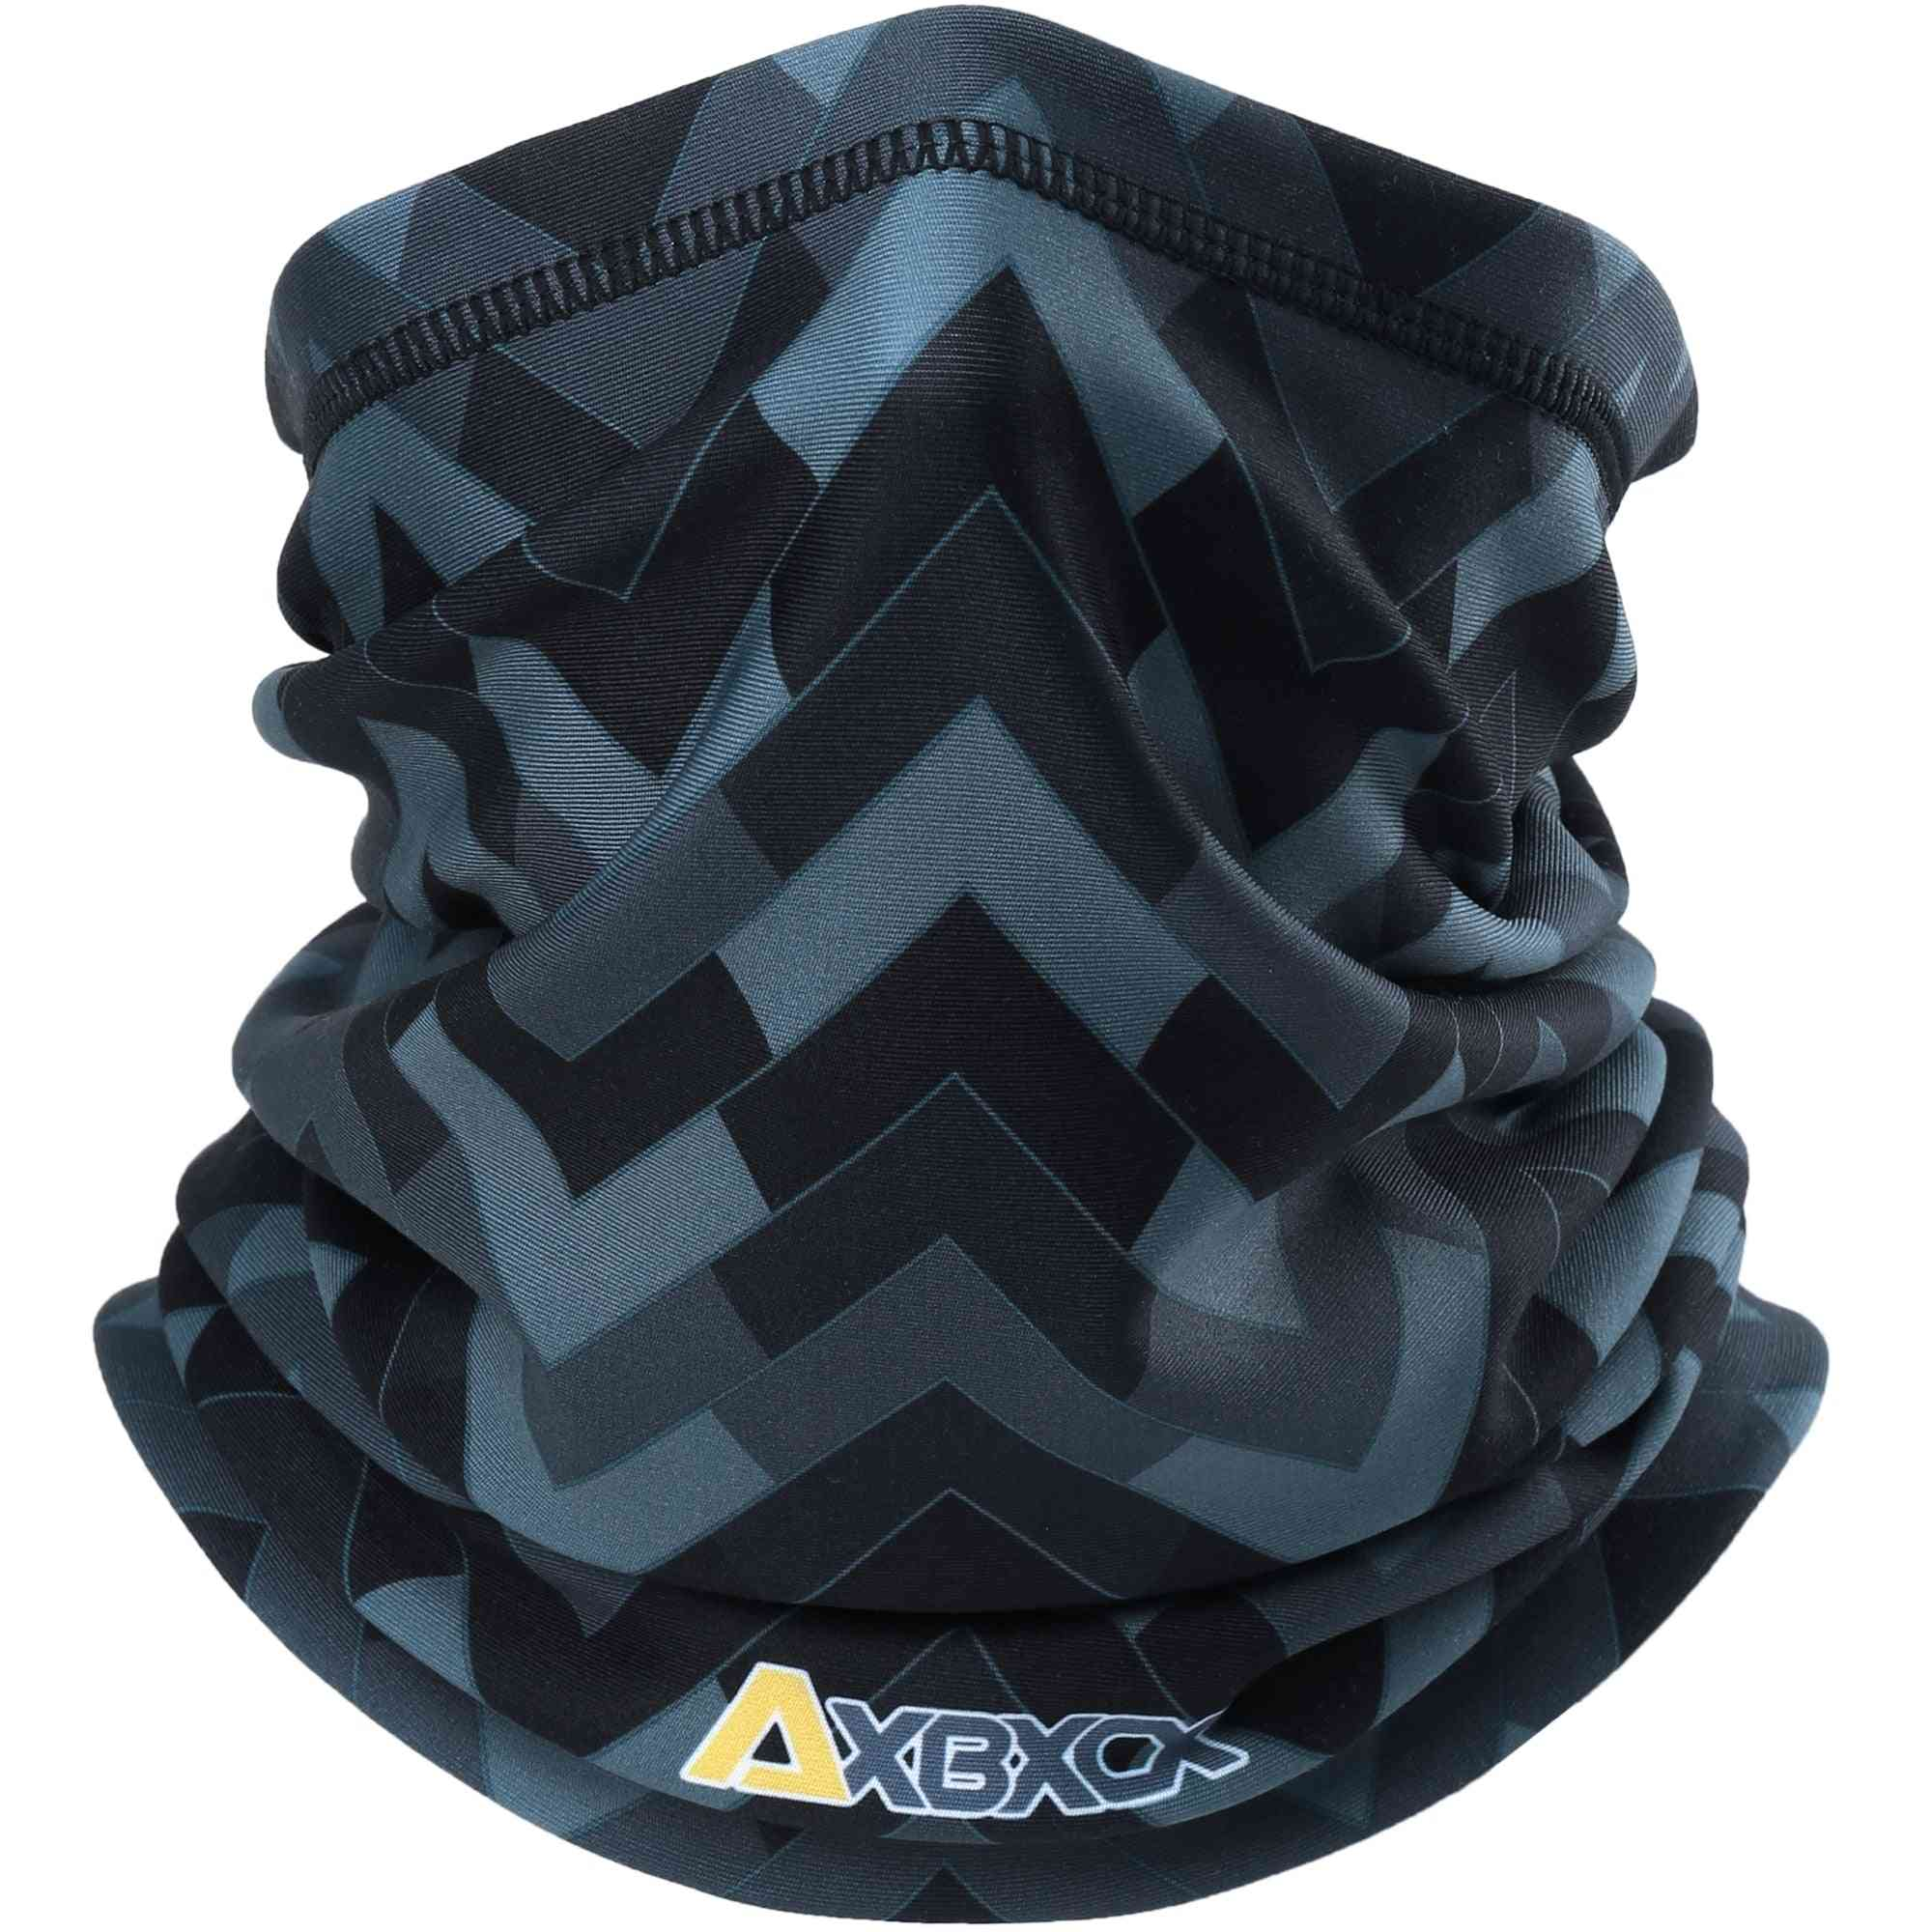 Winter Thermal Fleece Neck Gaiter Tube Scarf Warm Snowboard Half Face Cover